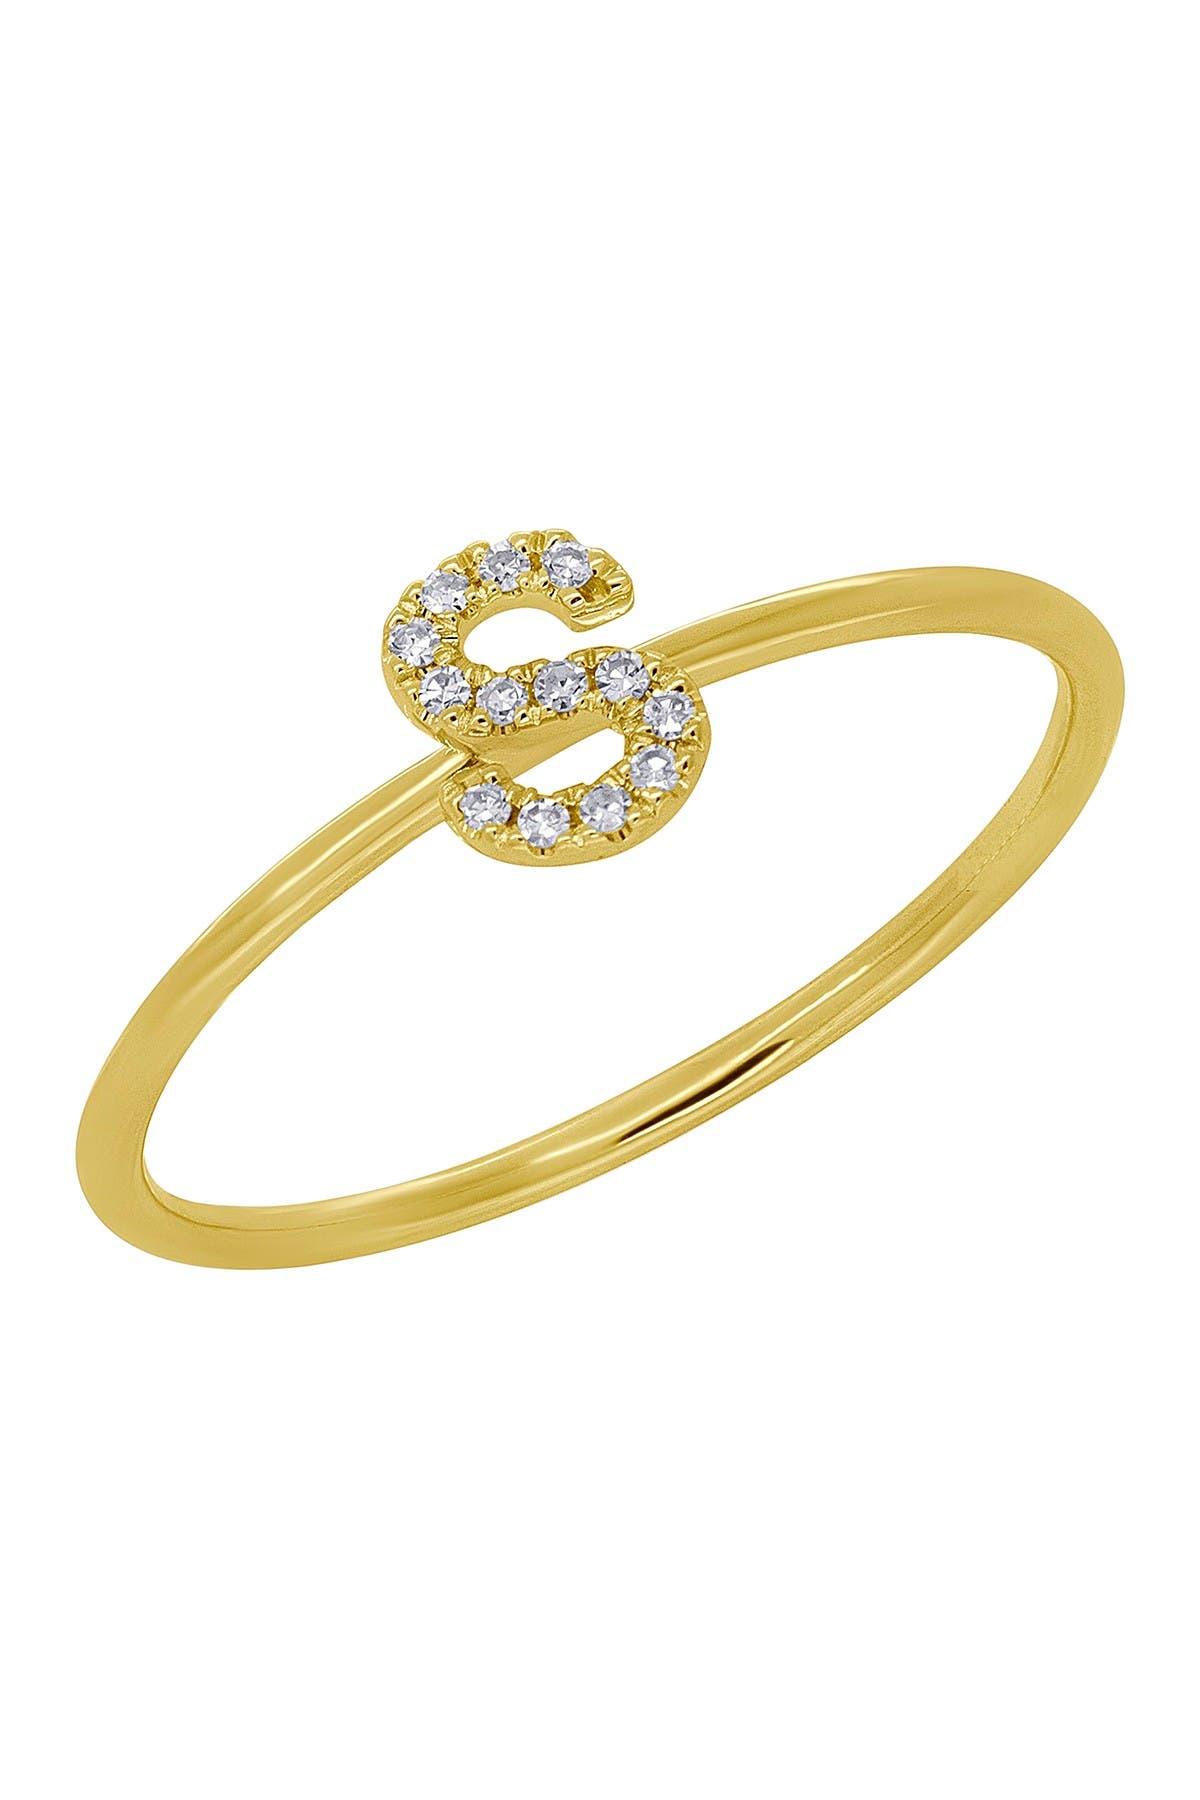 Image of Ron Hami 14K Yellow Gold Diamond Initial Ring - 0.04 ctw